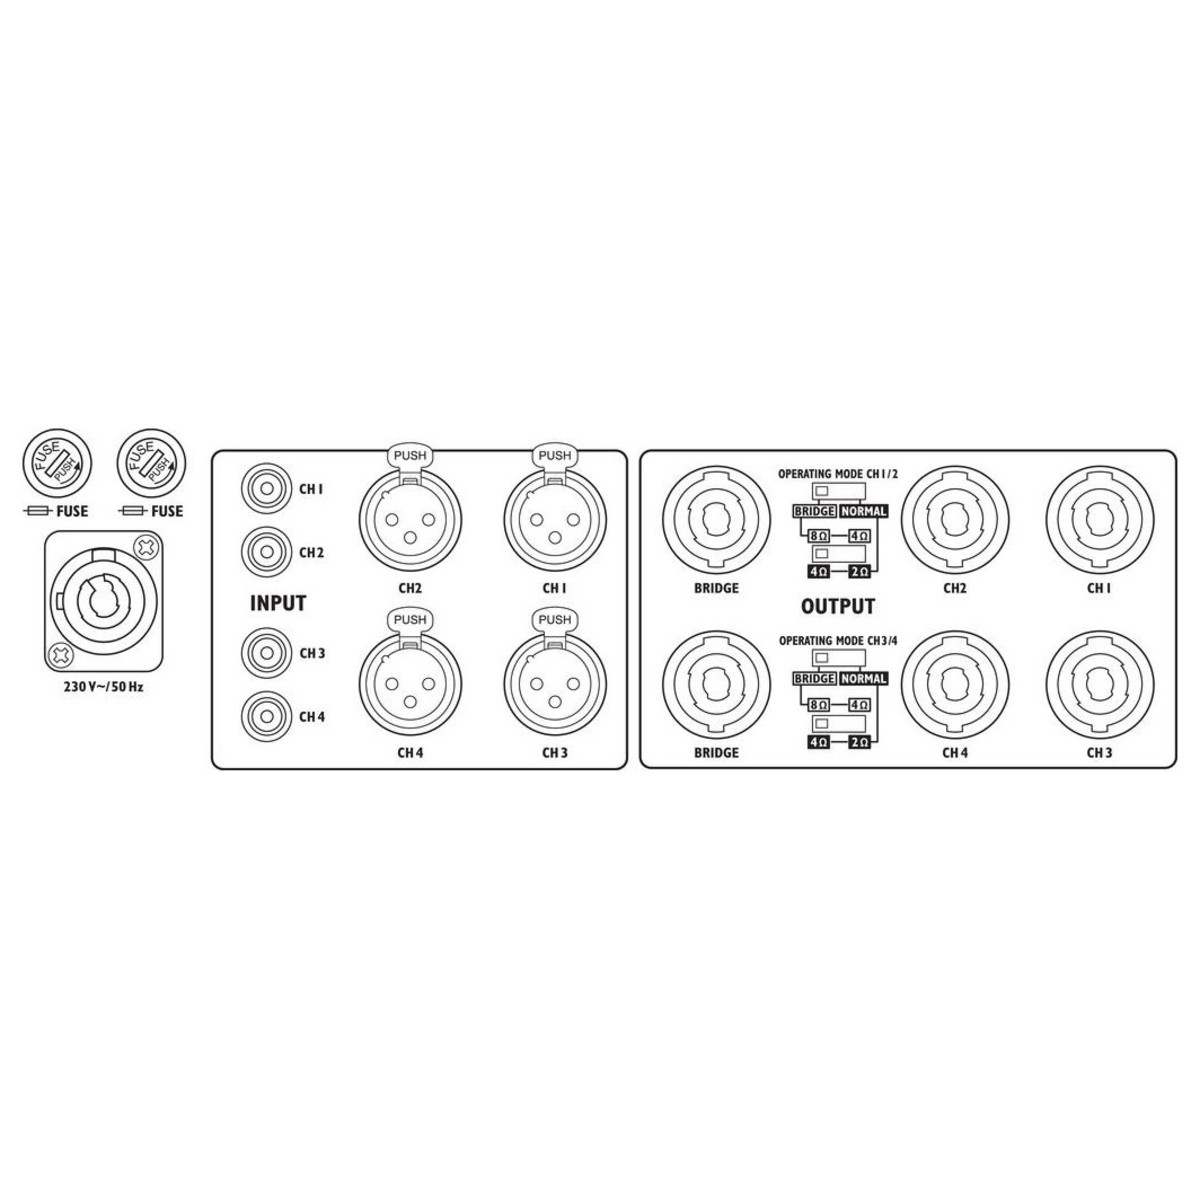 IMG Stageline STA-2000D 2000W Digital Power Amplifier at